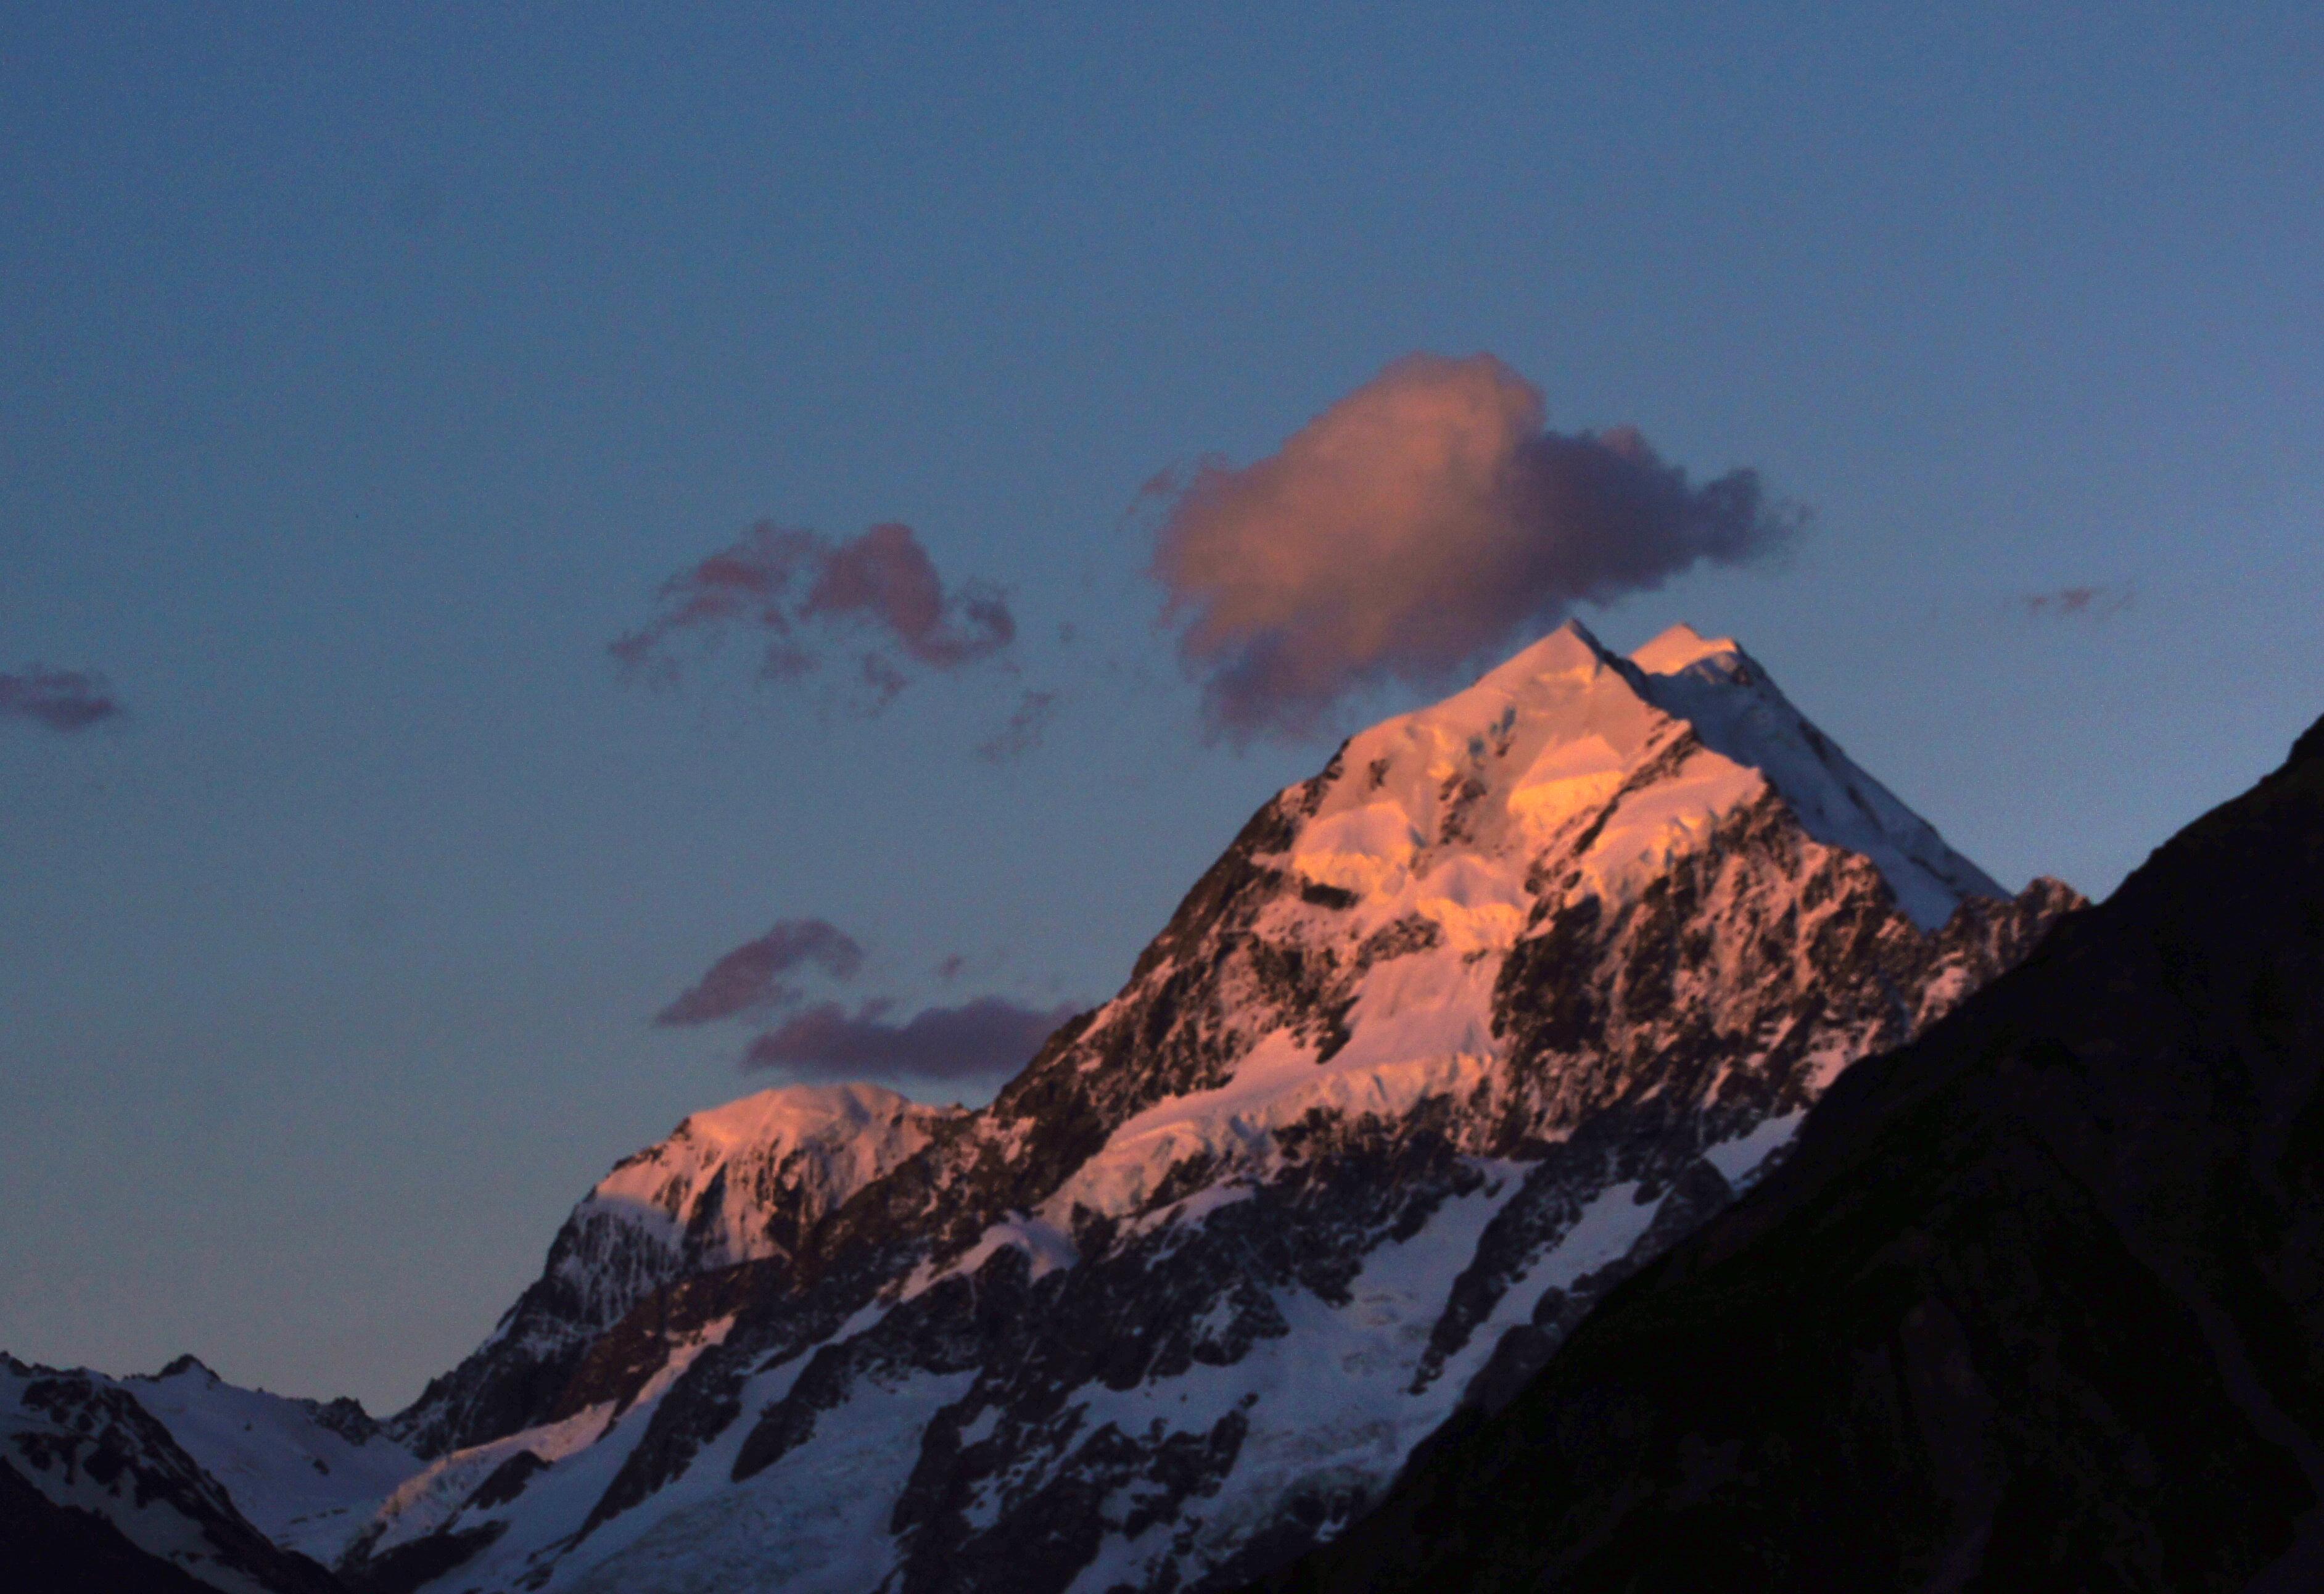 Mount Cook sunset., Public Domain Dedication (CC0), New zealand, Mountainside, Rock, HQ Photo